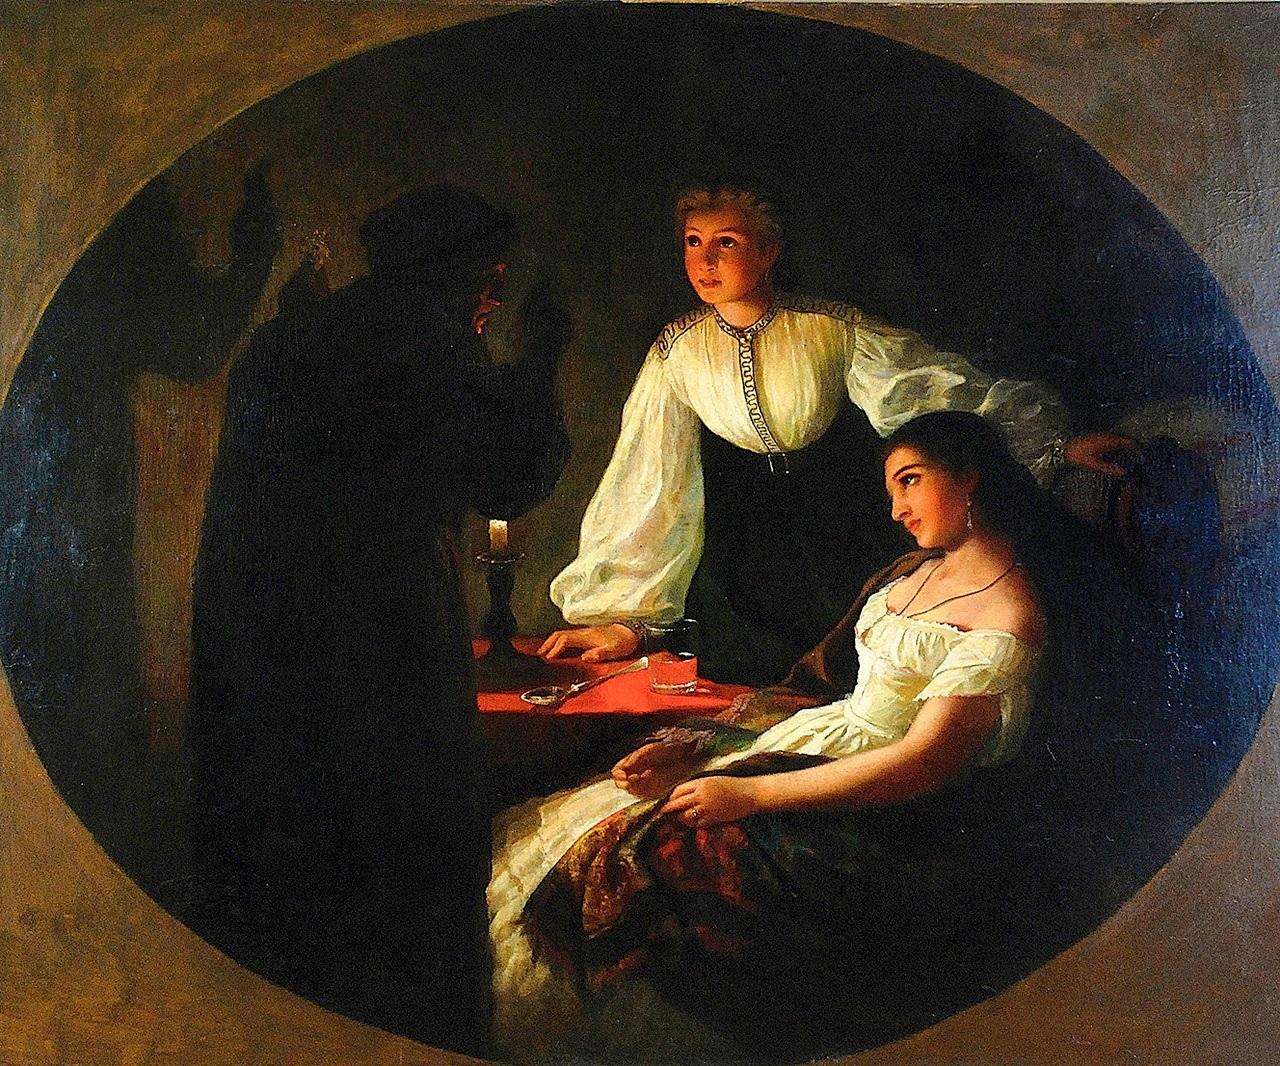 Saint Andrew's Day - Wikipedia